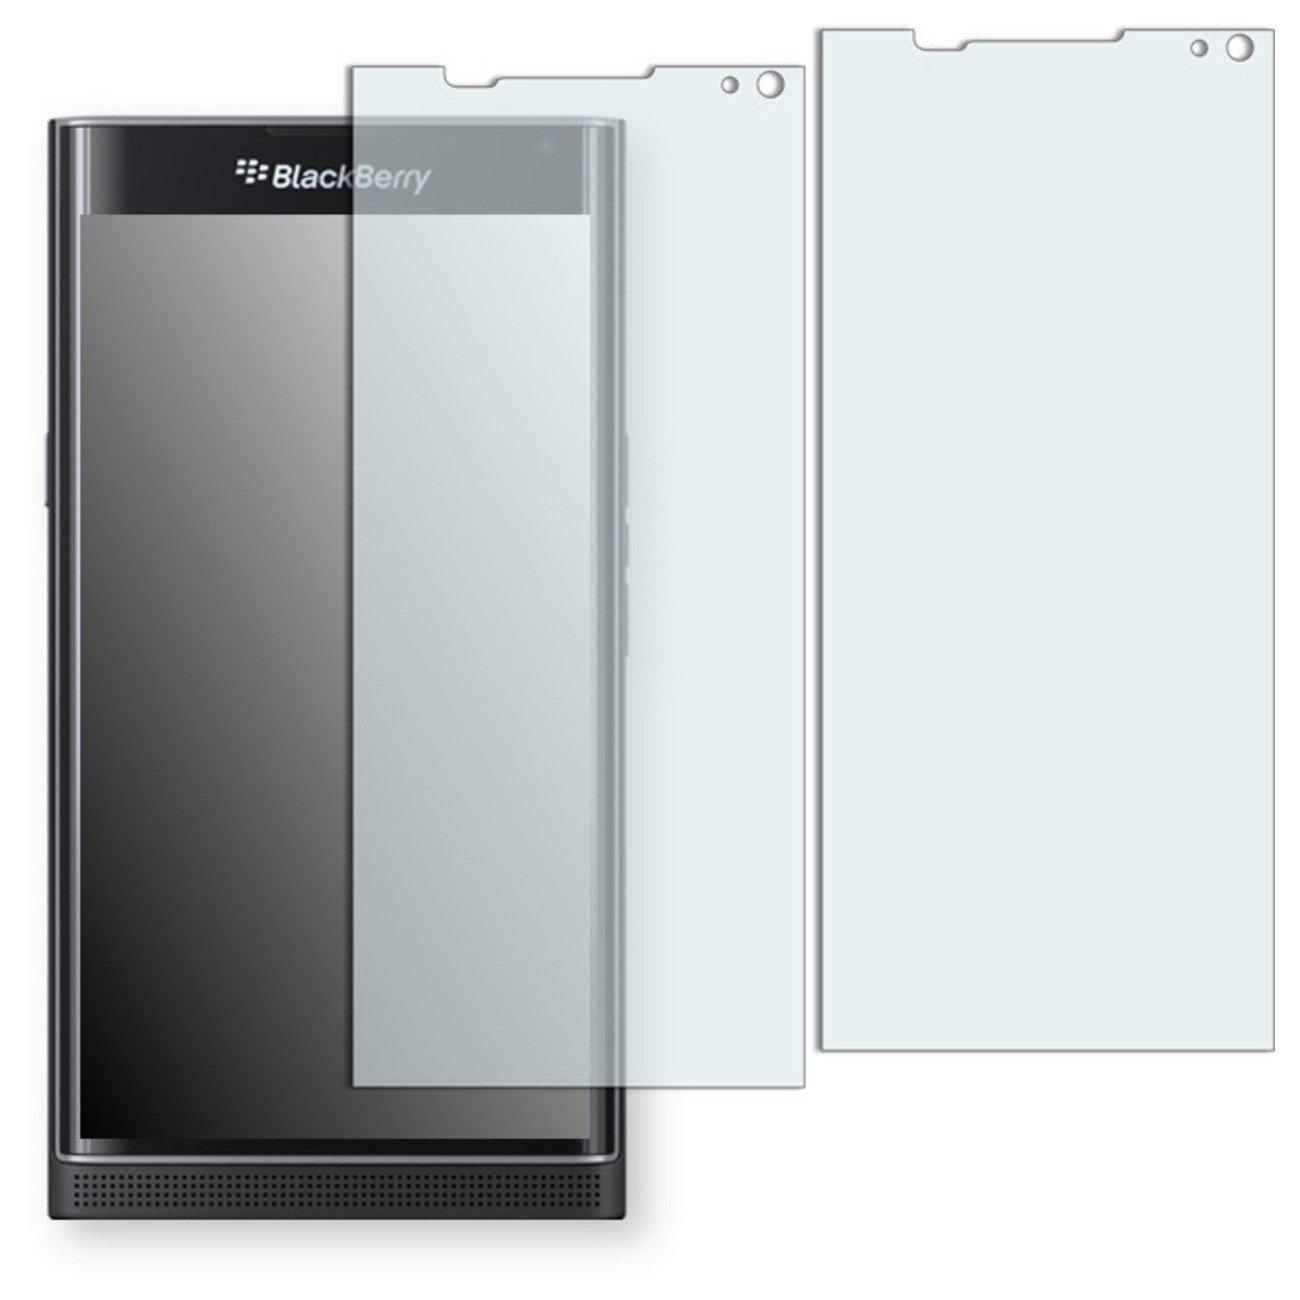 GOLEBO 2X Anti-Glare Screen Protector for BlackBerry Priv (Anti-Reflex, Air Pocket Free Application, Easy to Remove) (Reduced foil)